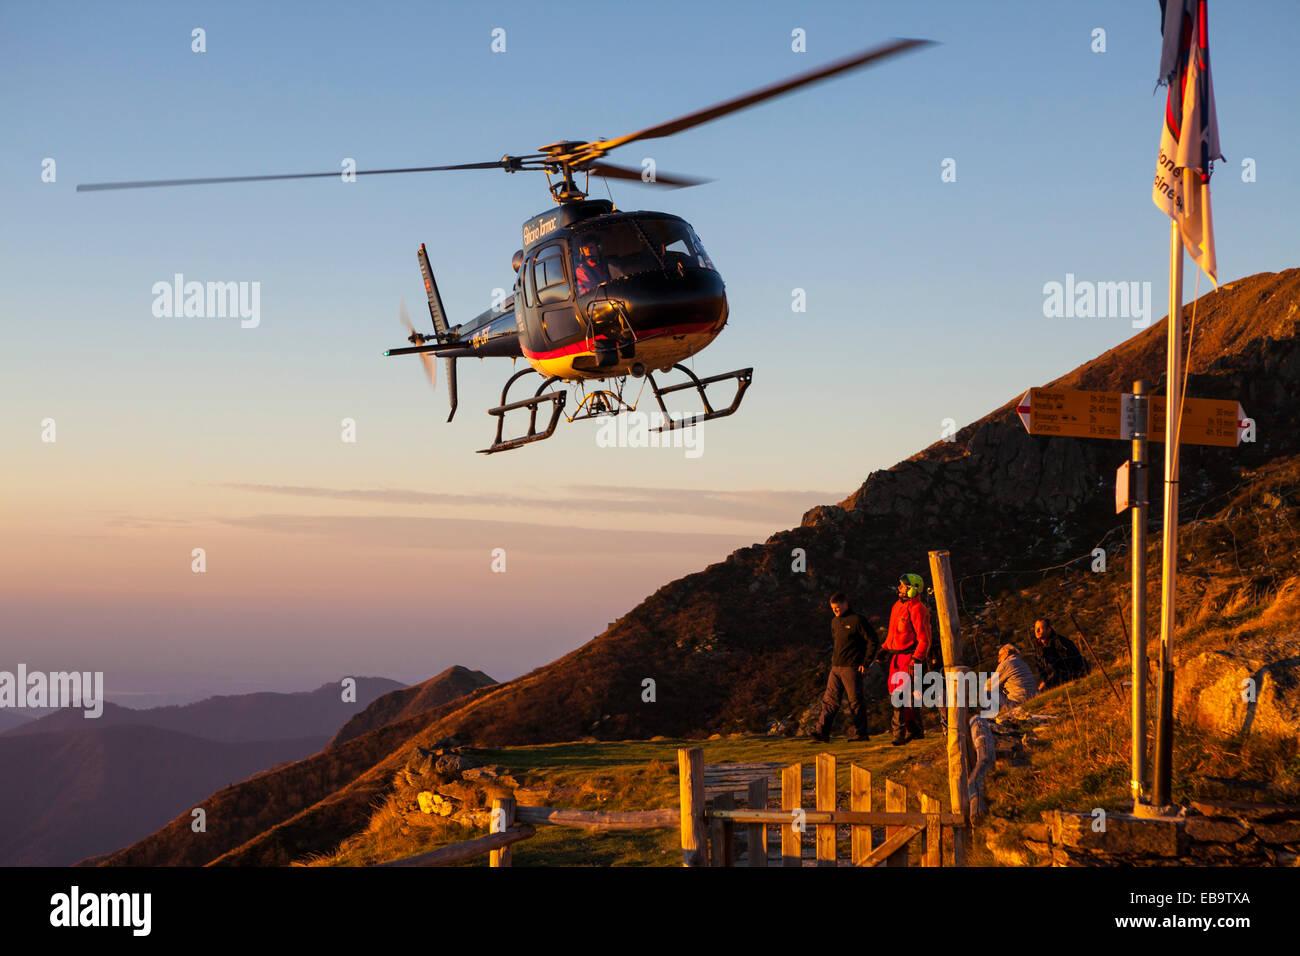 A Helicopter at Rifugio Al Legn, near Brissago, Kanton Tessin, Switzerland Stock Photo